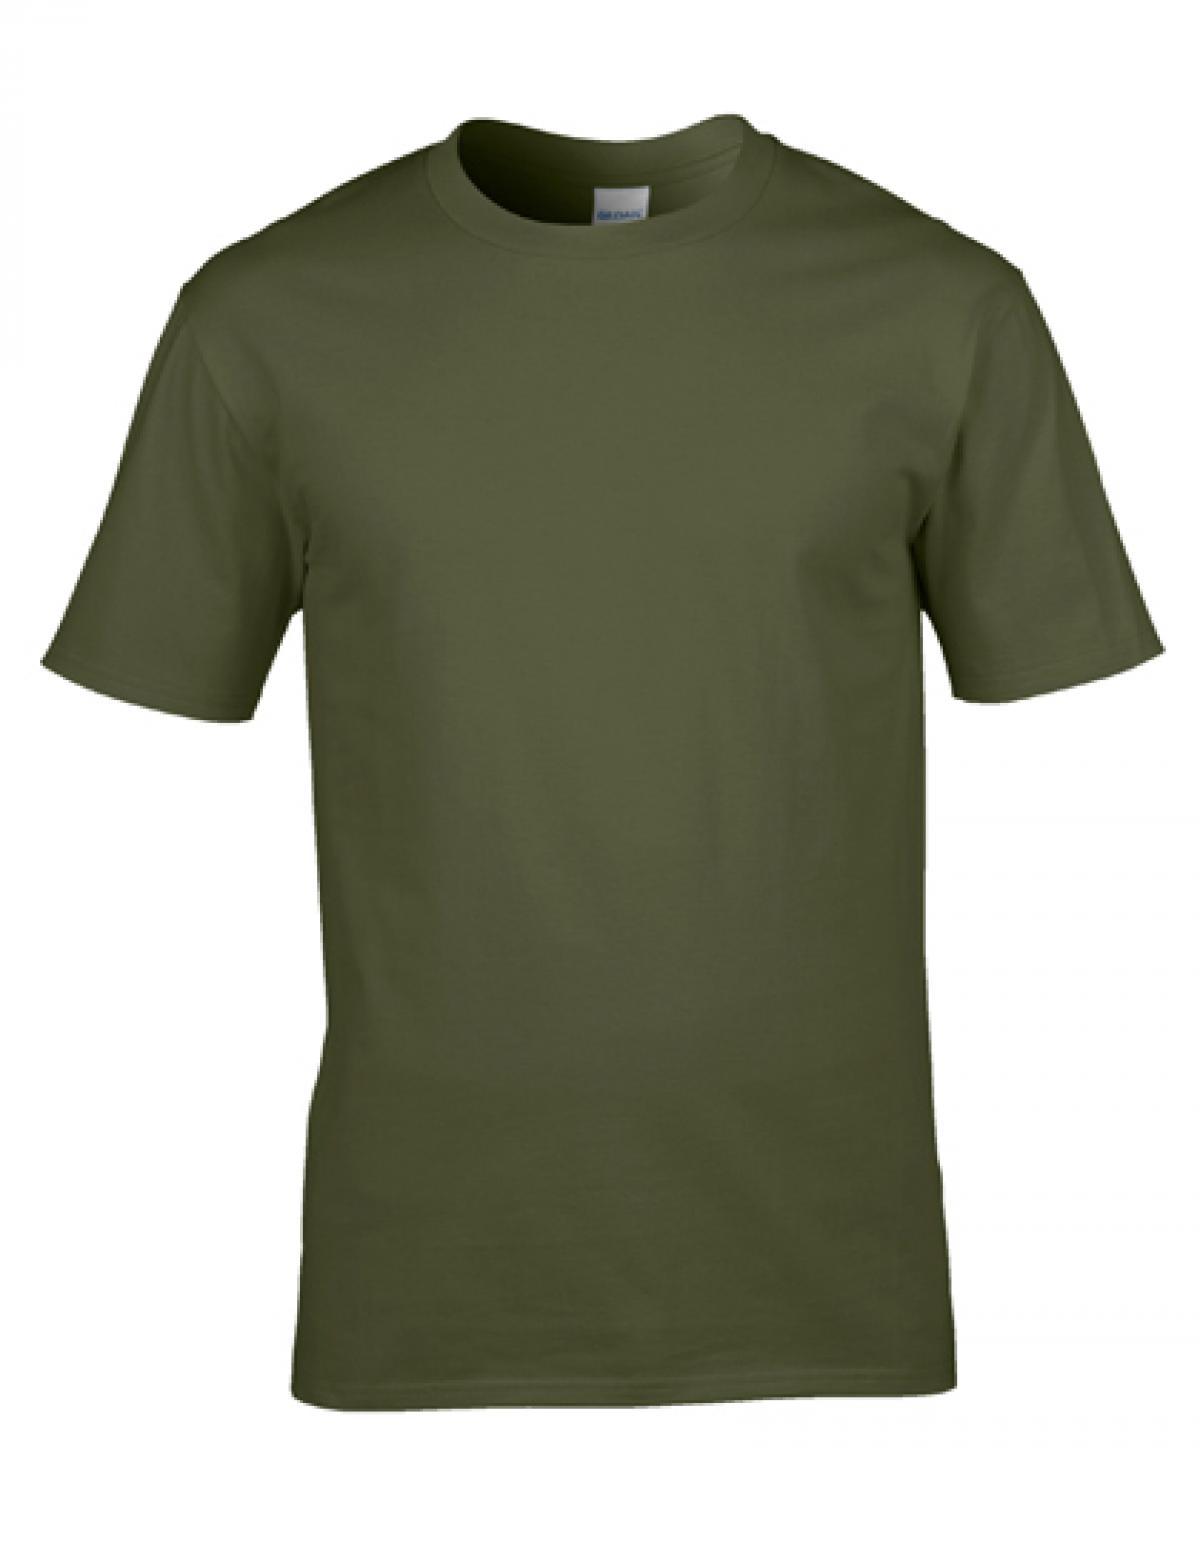 premium cotton herren t shirt rexlander s. Black Bedroom Furniture Sets. Home Design Ideas